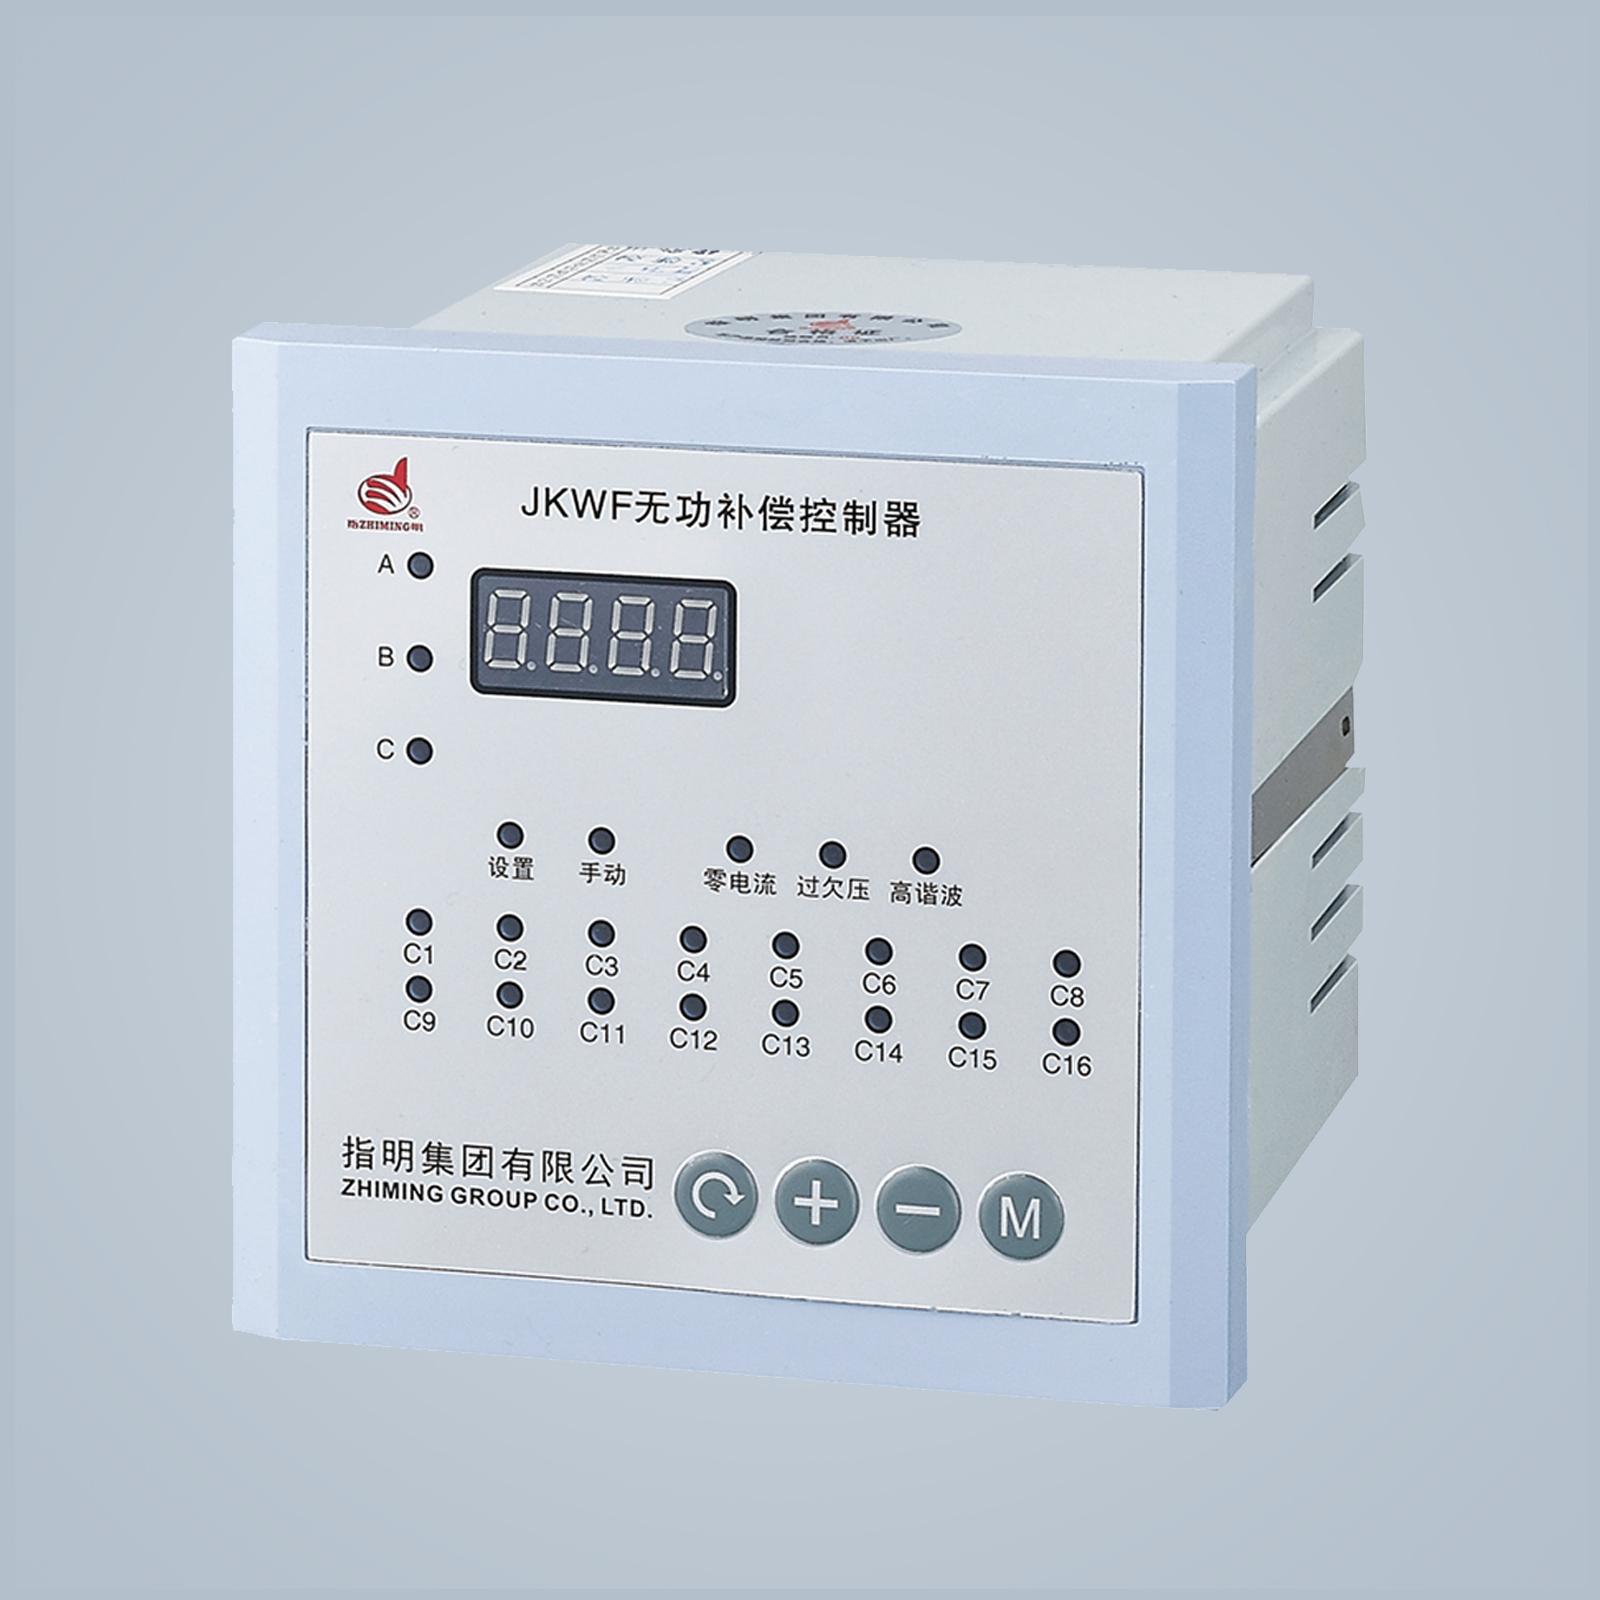 Jkwf W Intelligent Reactive Power Compensation Controller Zhiming Group Co Ltd